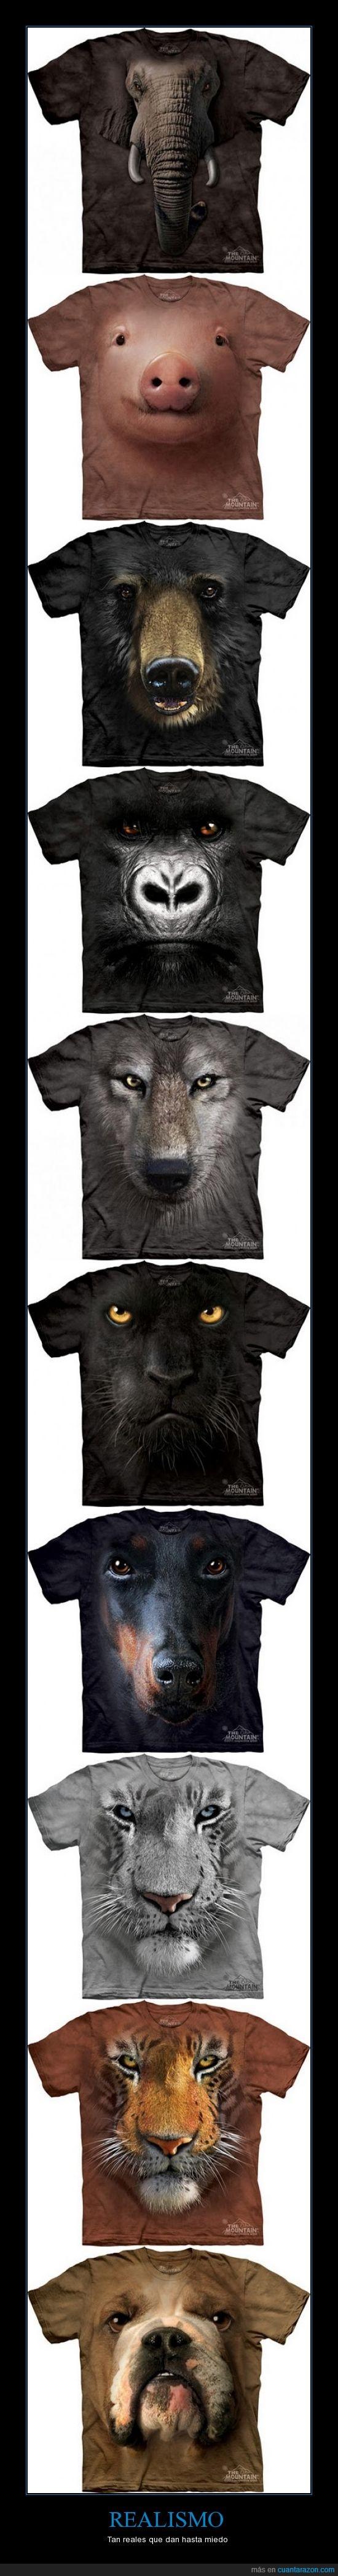 animales,camisetas,realismo